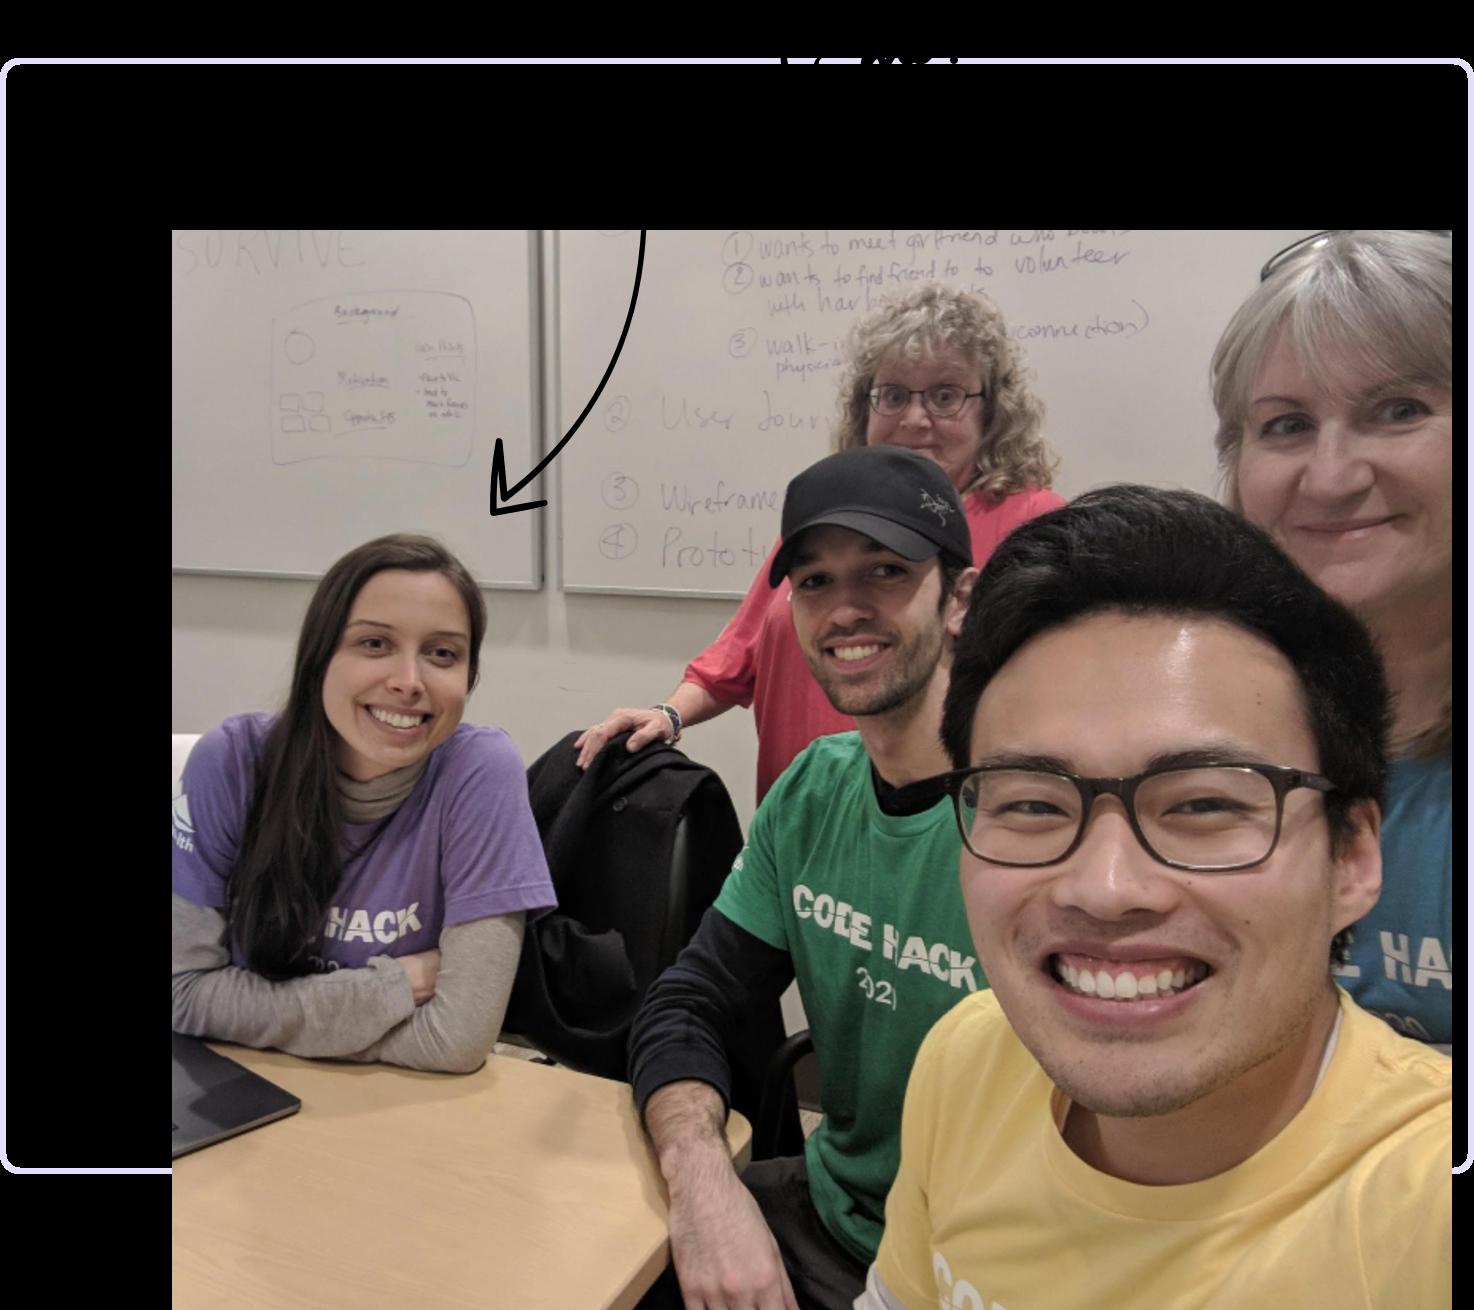 Group photo of five team members